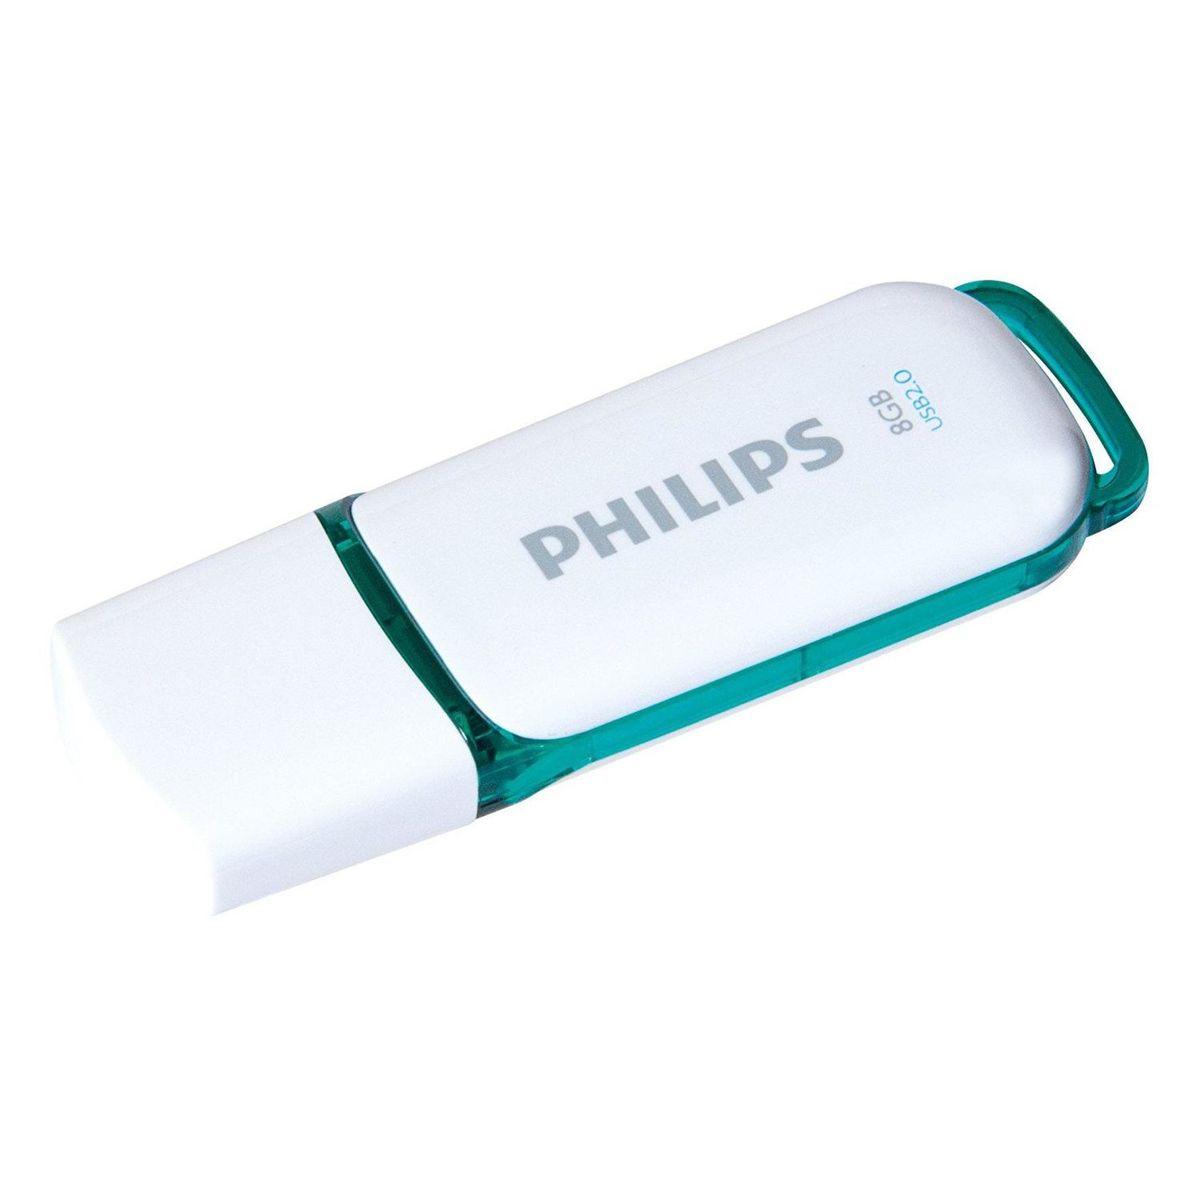 Philips - USB-stick 2.0 - 8GB